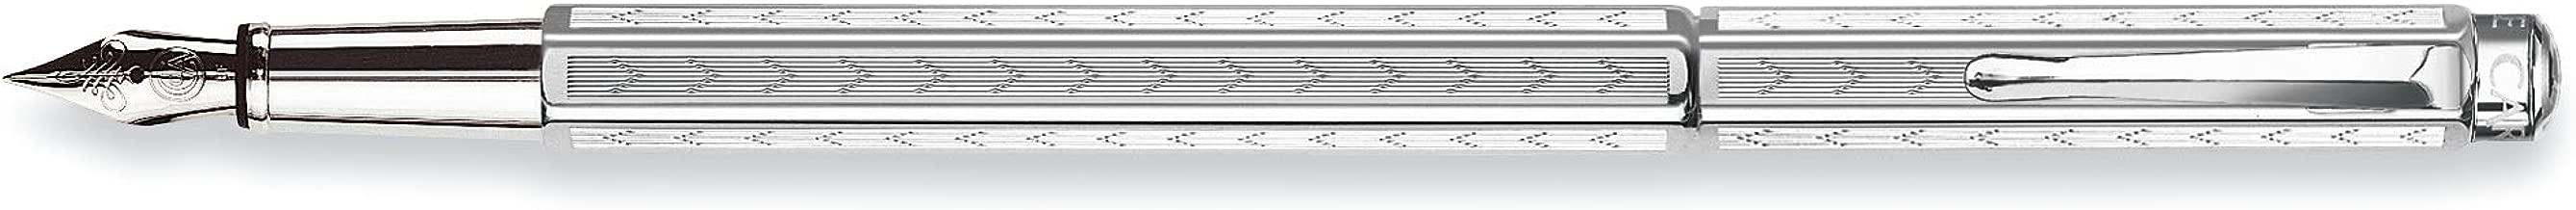 Caran D' Ache Chevron Ecridor Silver Plated/Rhodium Coat Fountain Pen Nib M (0958.286)